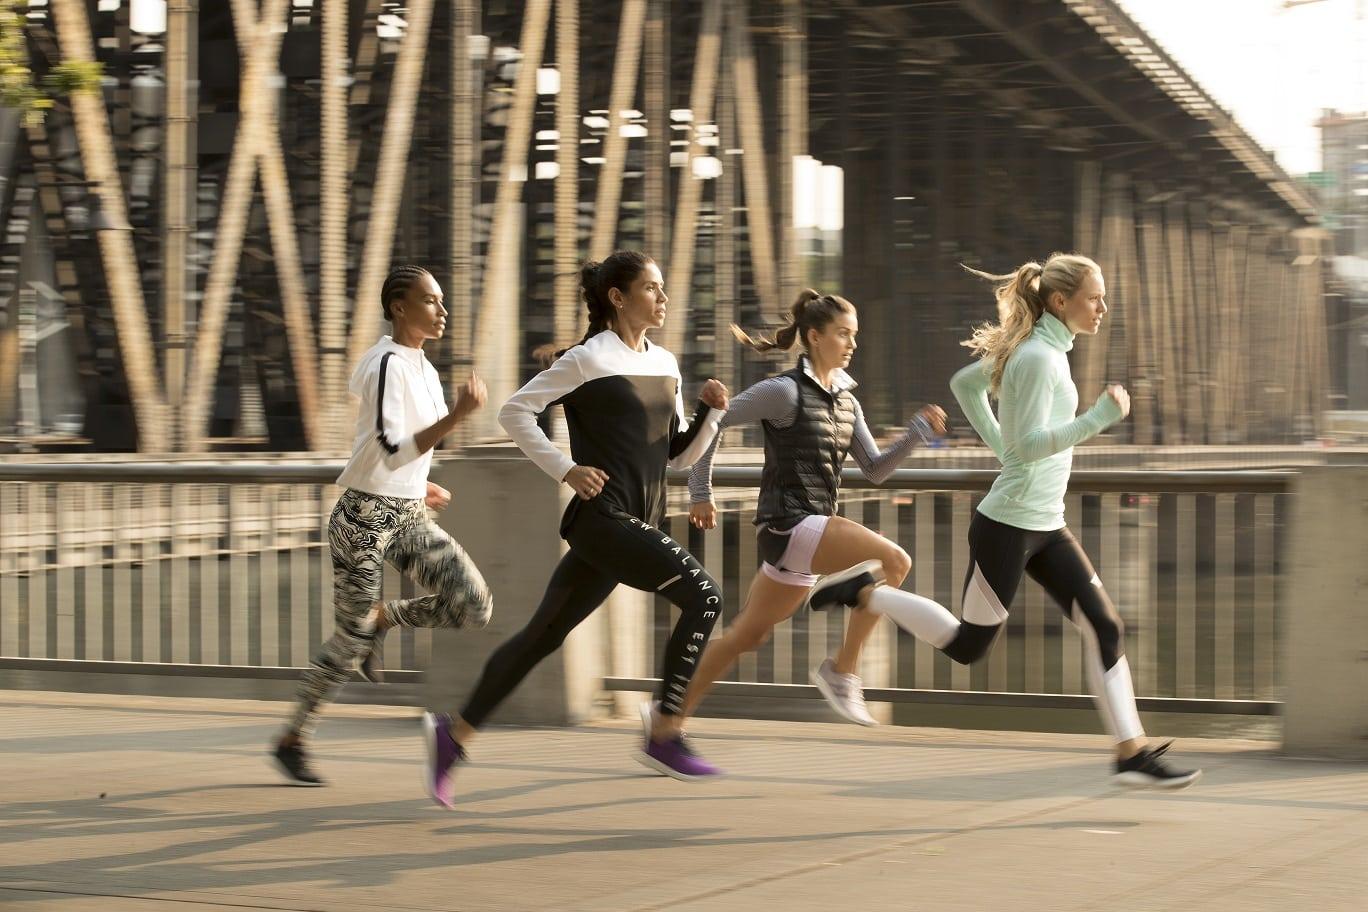 Running Aquitaine Calendrier.La Feminisation Du Running Mode Ou Veritable Phenomene De